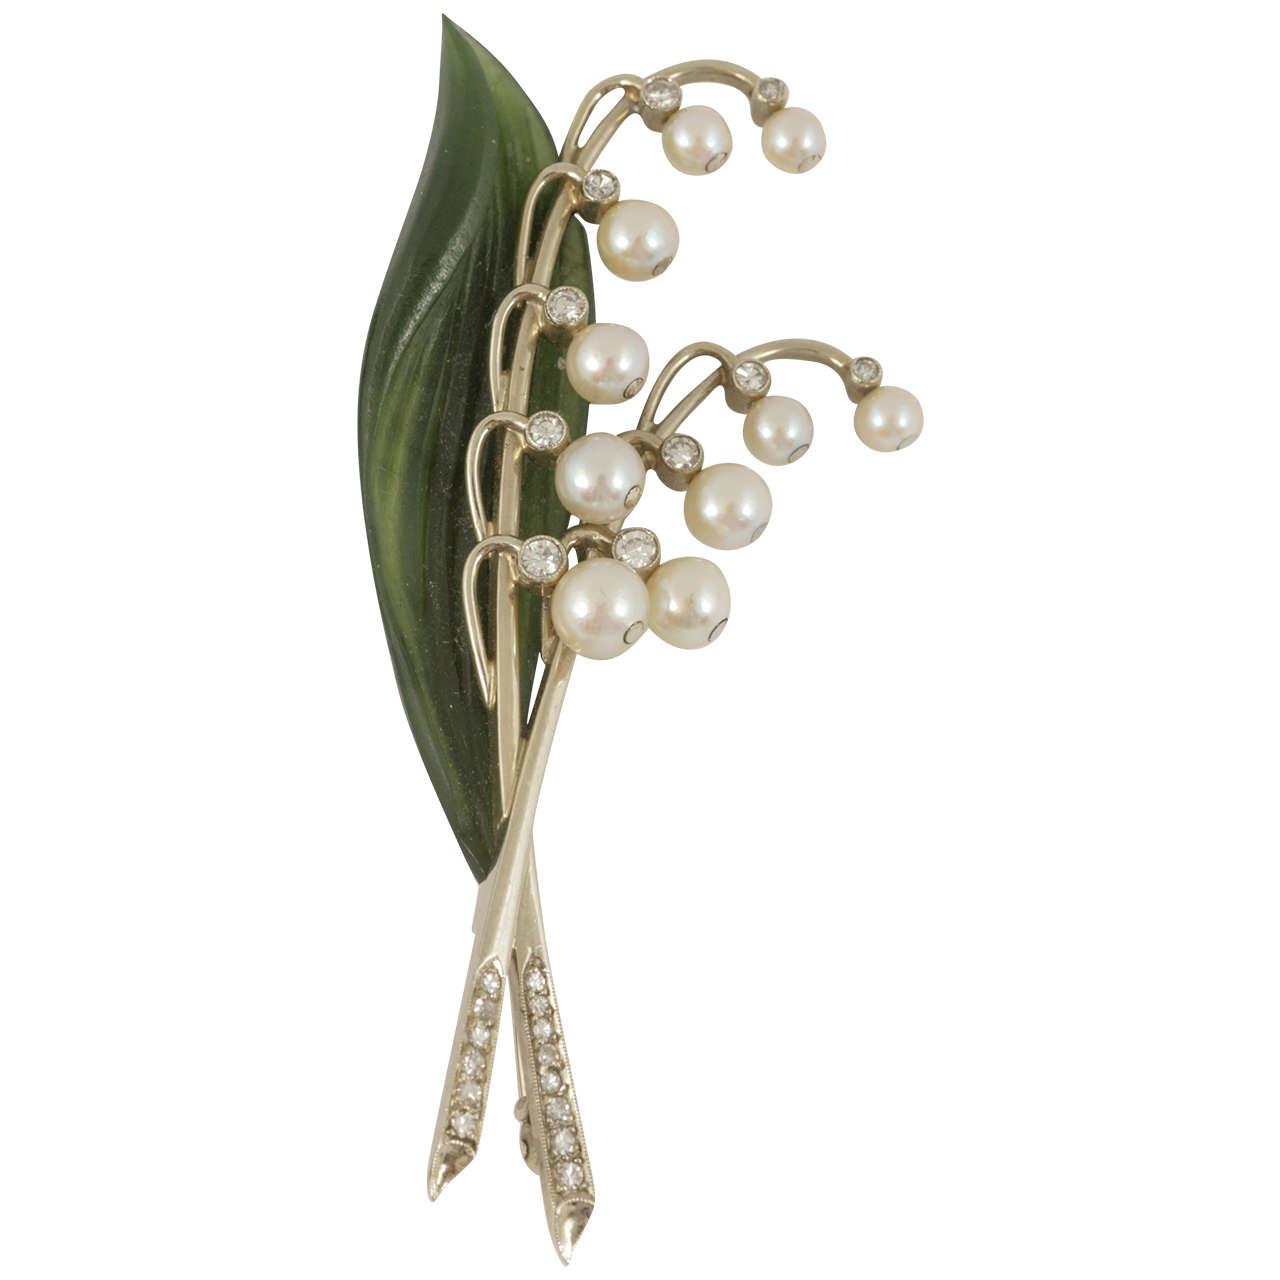 Austrian natural pearl nephrite diamond lily of the valley spray austrian natural pearl nephrite diamond lily of the valley spray brooch for sale izmirmasajfo Gallery